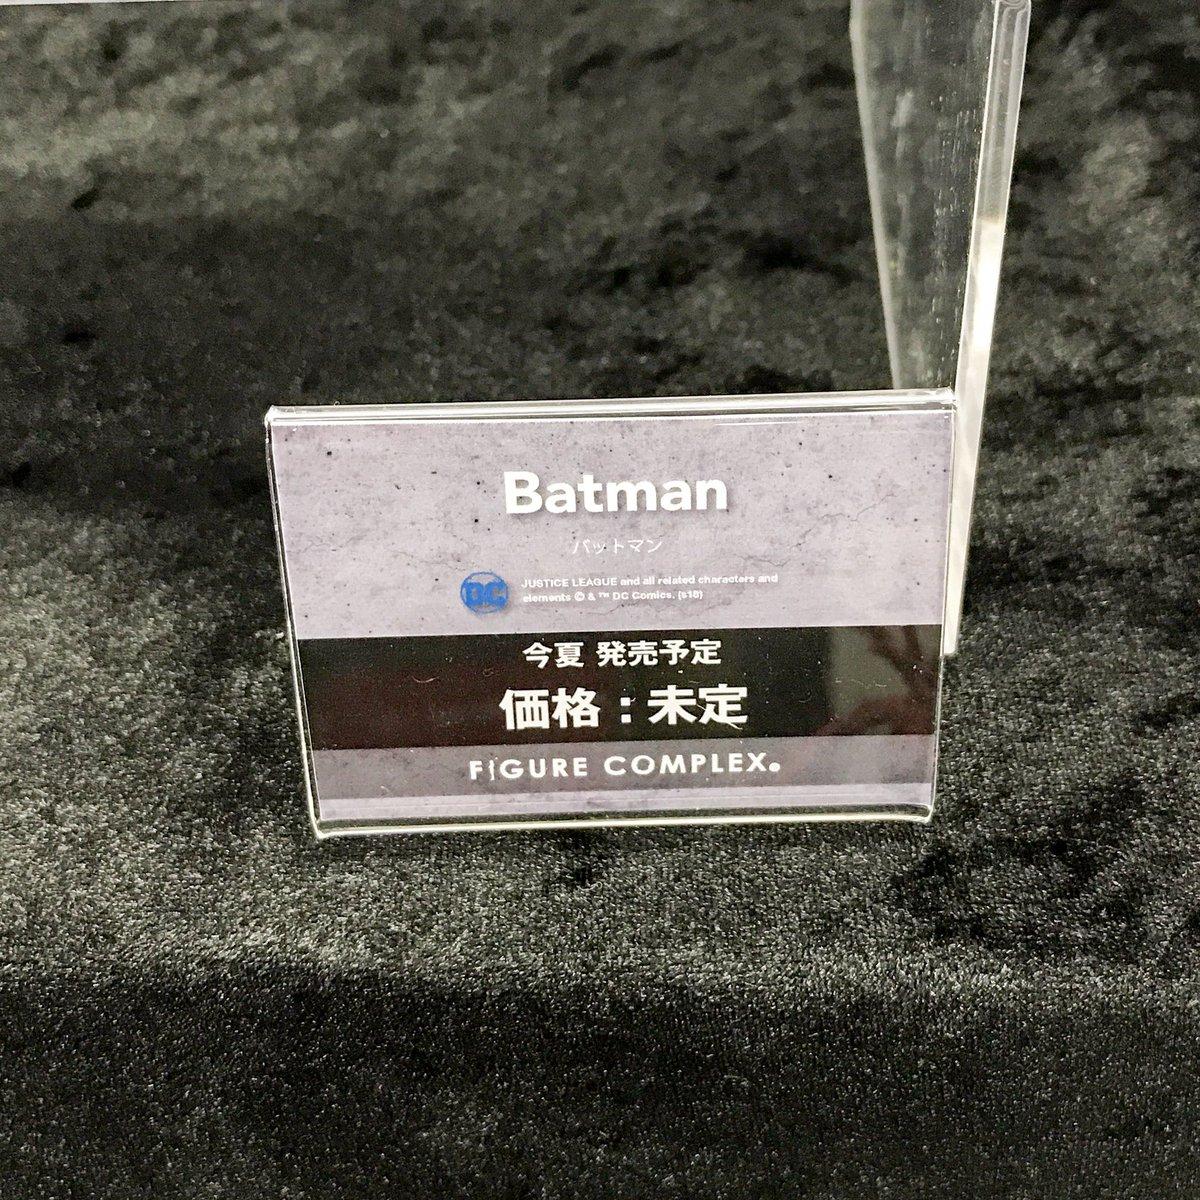 Batman - Amazing Yamaguchi - Figure Complex (Revoltech) 2skycAGa_o